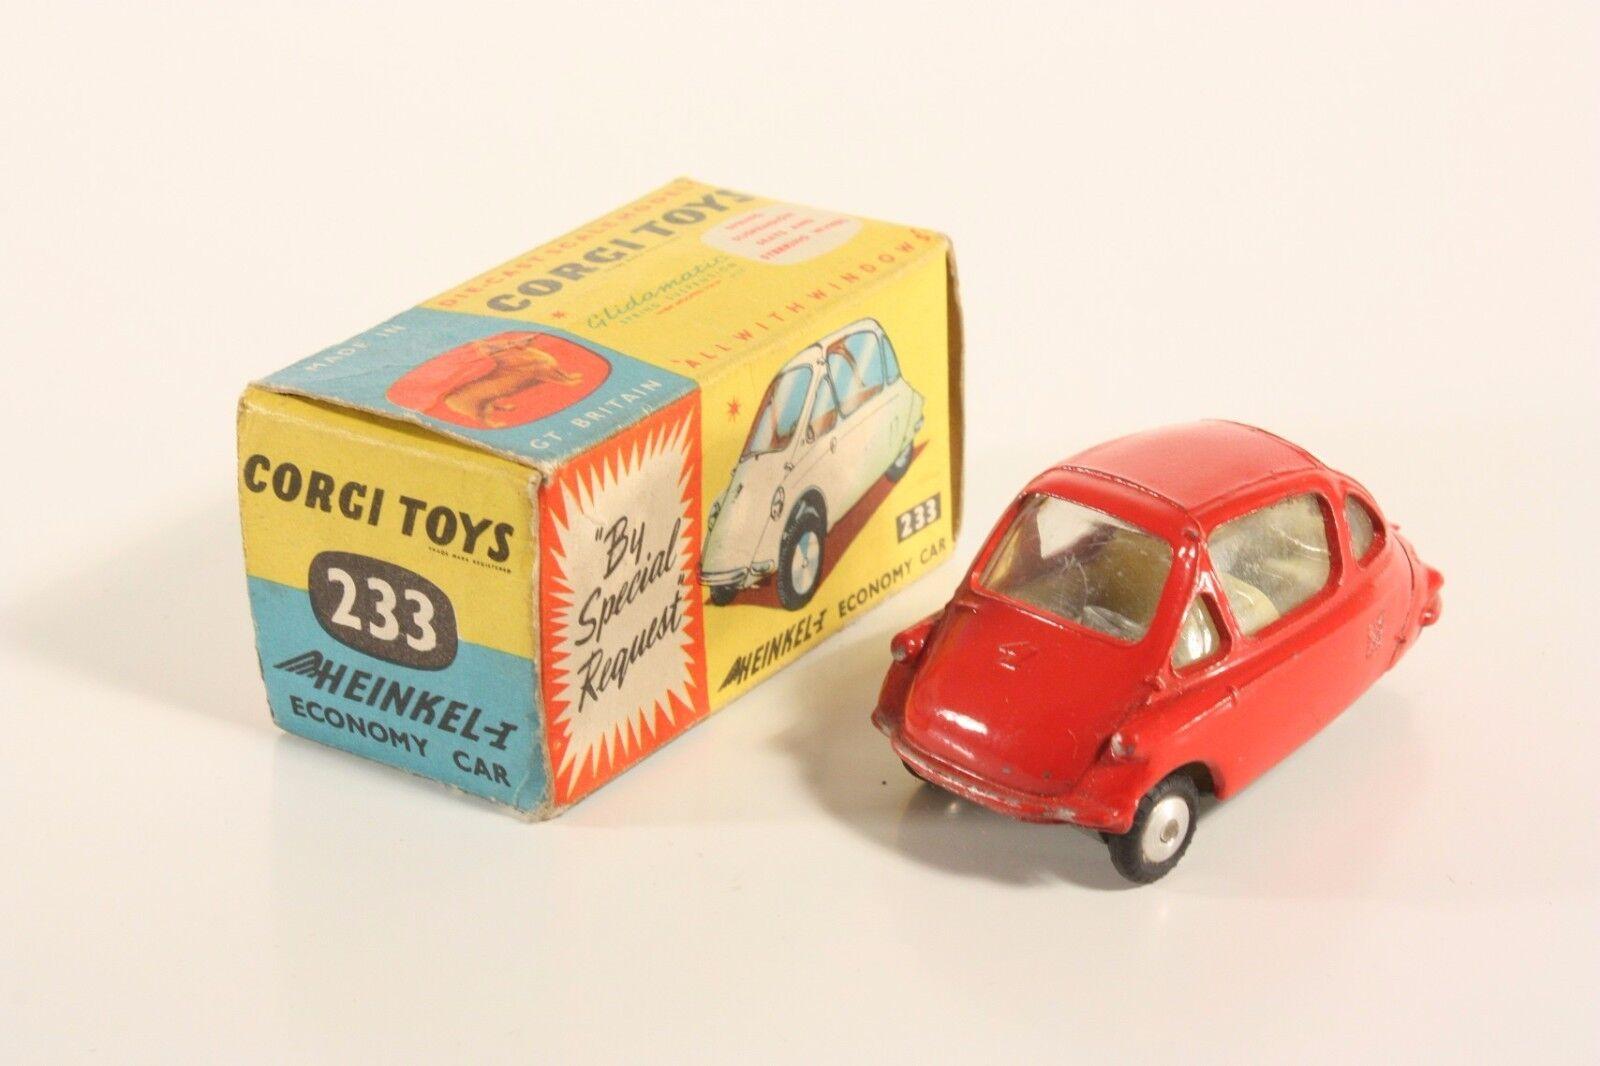 CORGI TOYS 233, HEINKEL ECONOMY CAR, Comme neuf in box  ab2083